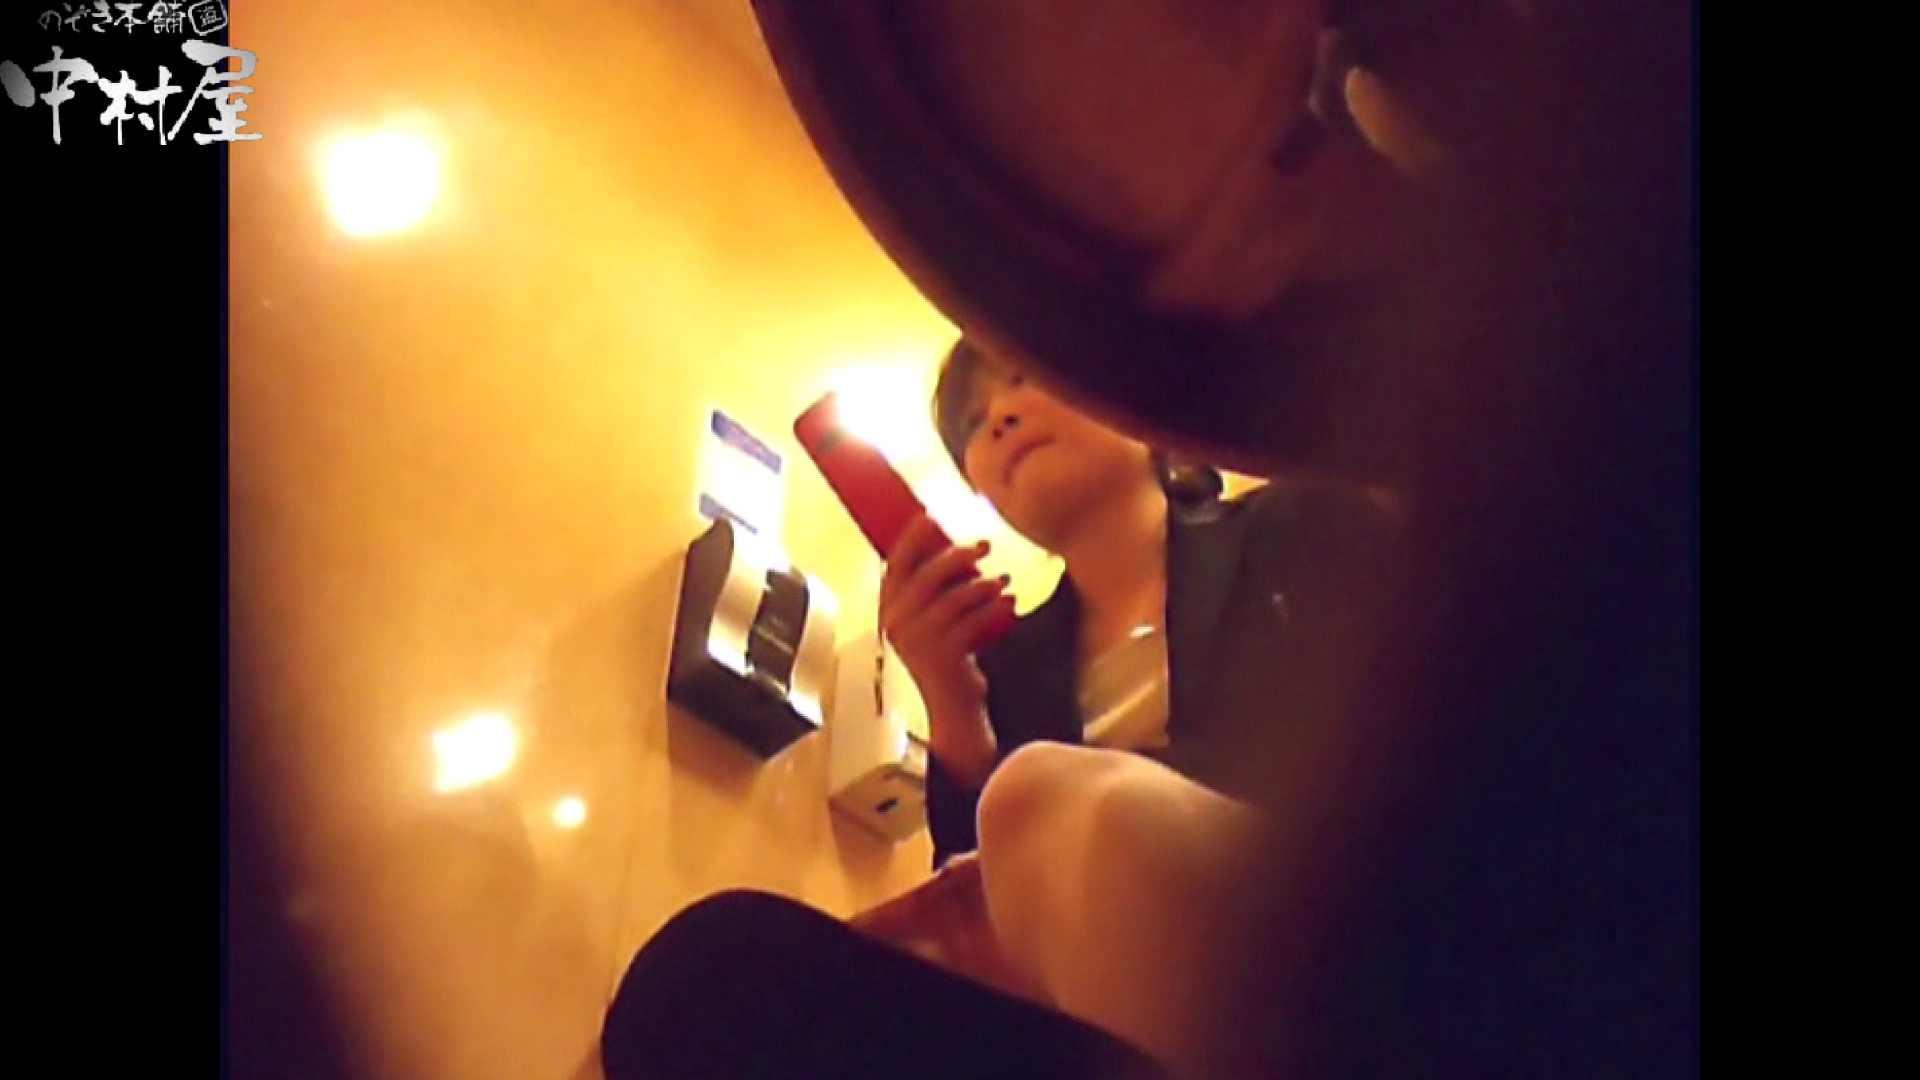 突撃!女子化粧室の真実vol.32前編 巨乳 ワレメ動画紹介 44連発 28